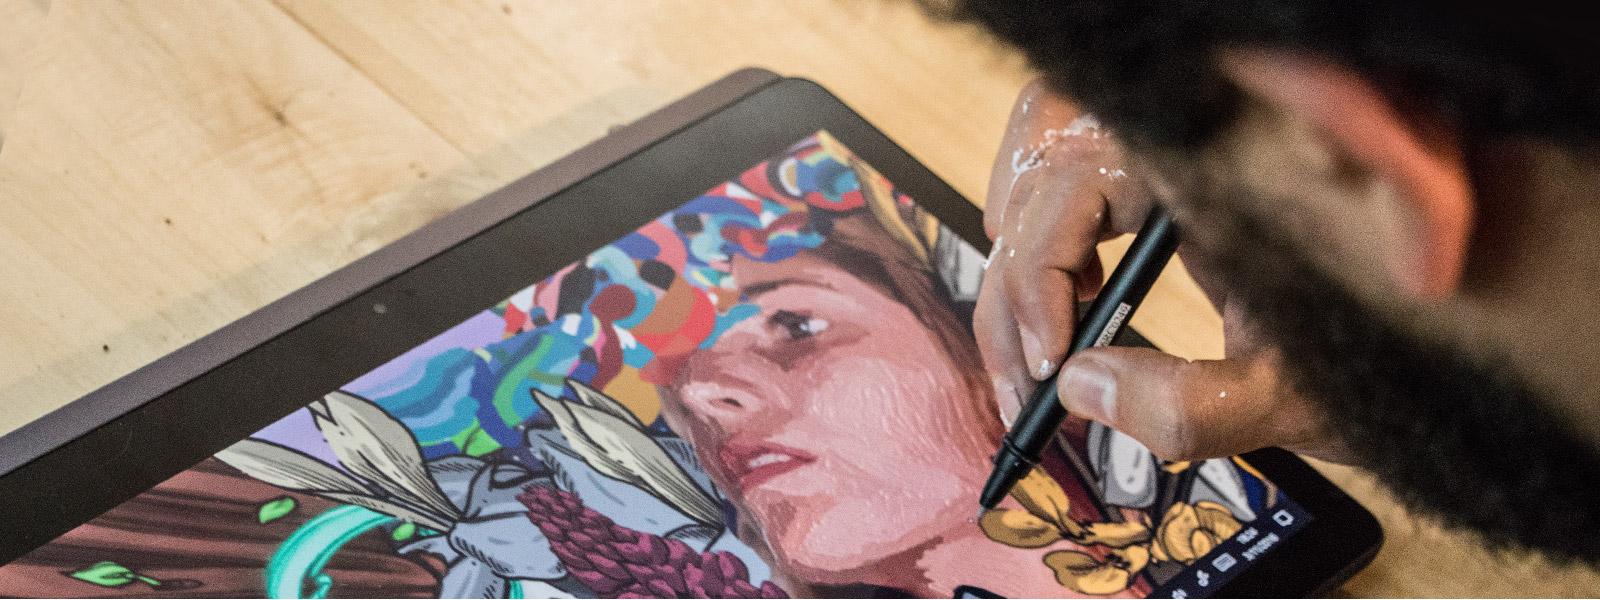 Pracovní prostor Windows Ink vrežimu tabletu Lenovo Yoga